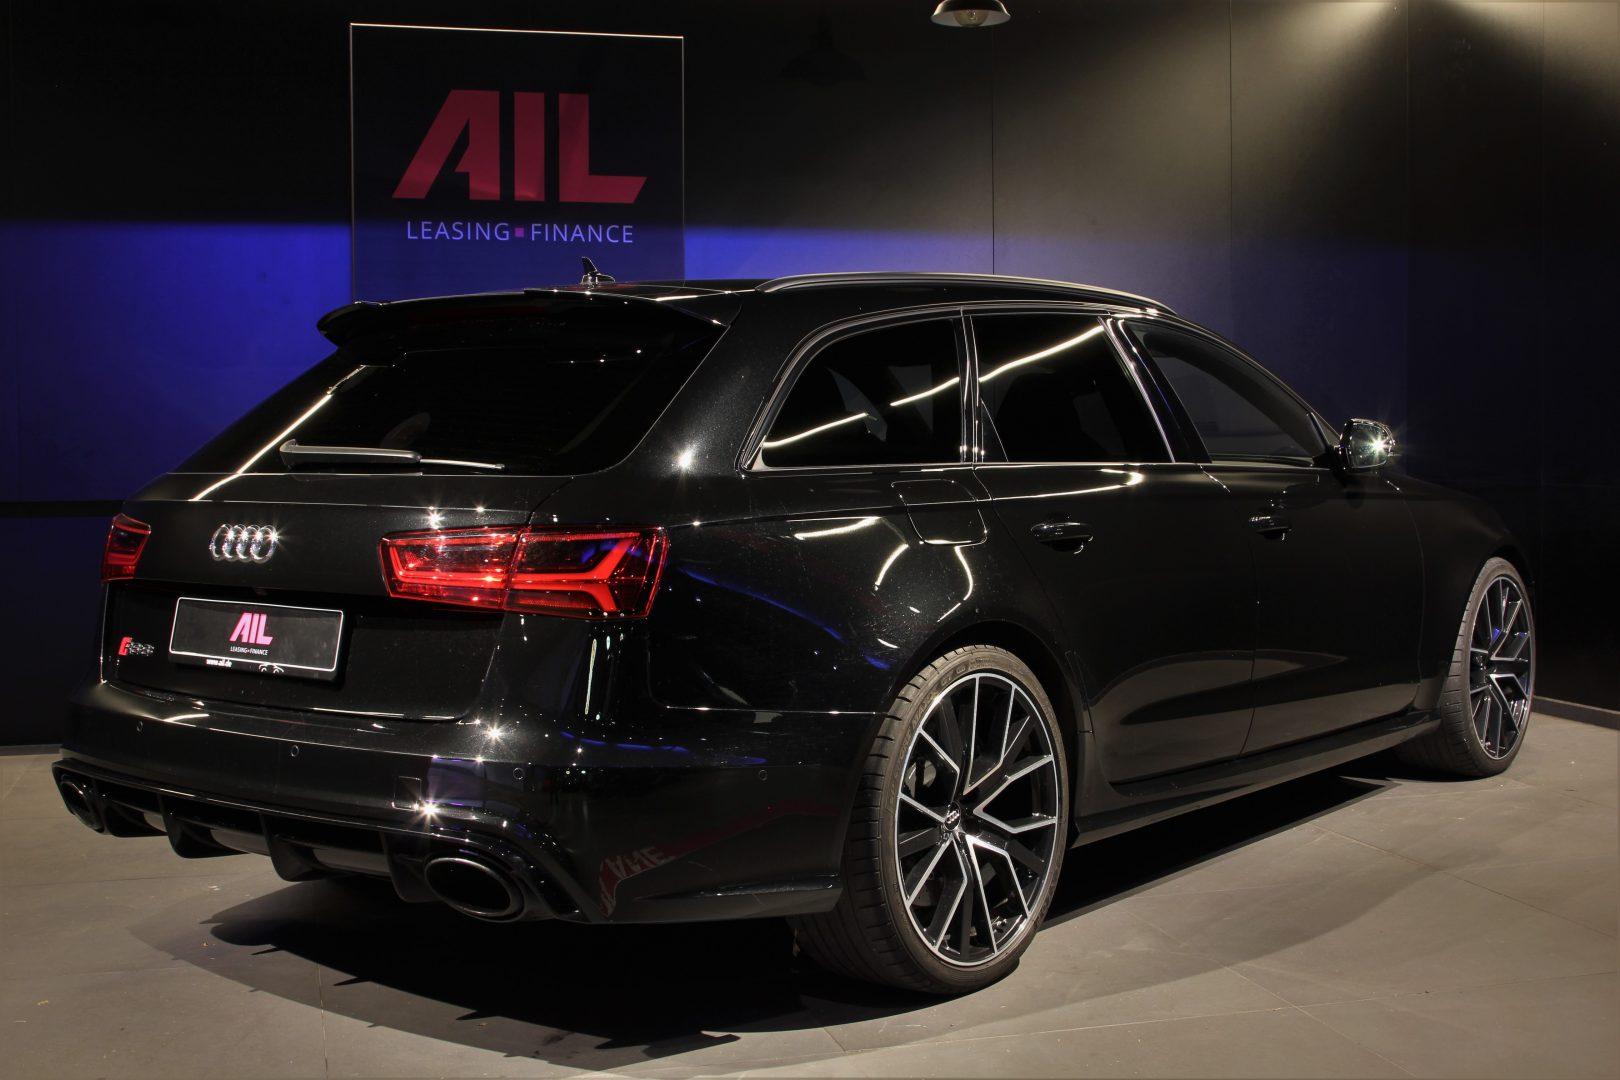 AIL Audi RS6 Avant Performance 4.0 TFSI Carbon Paket  1